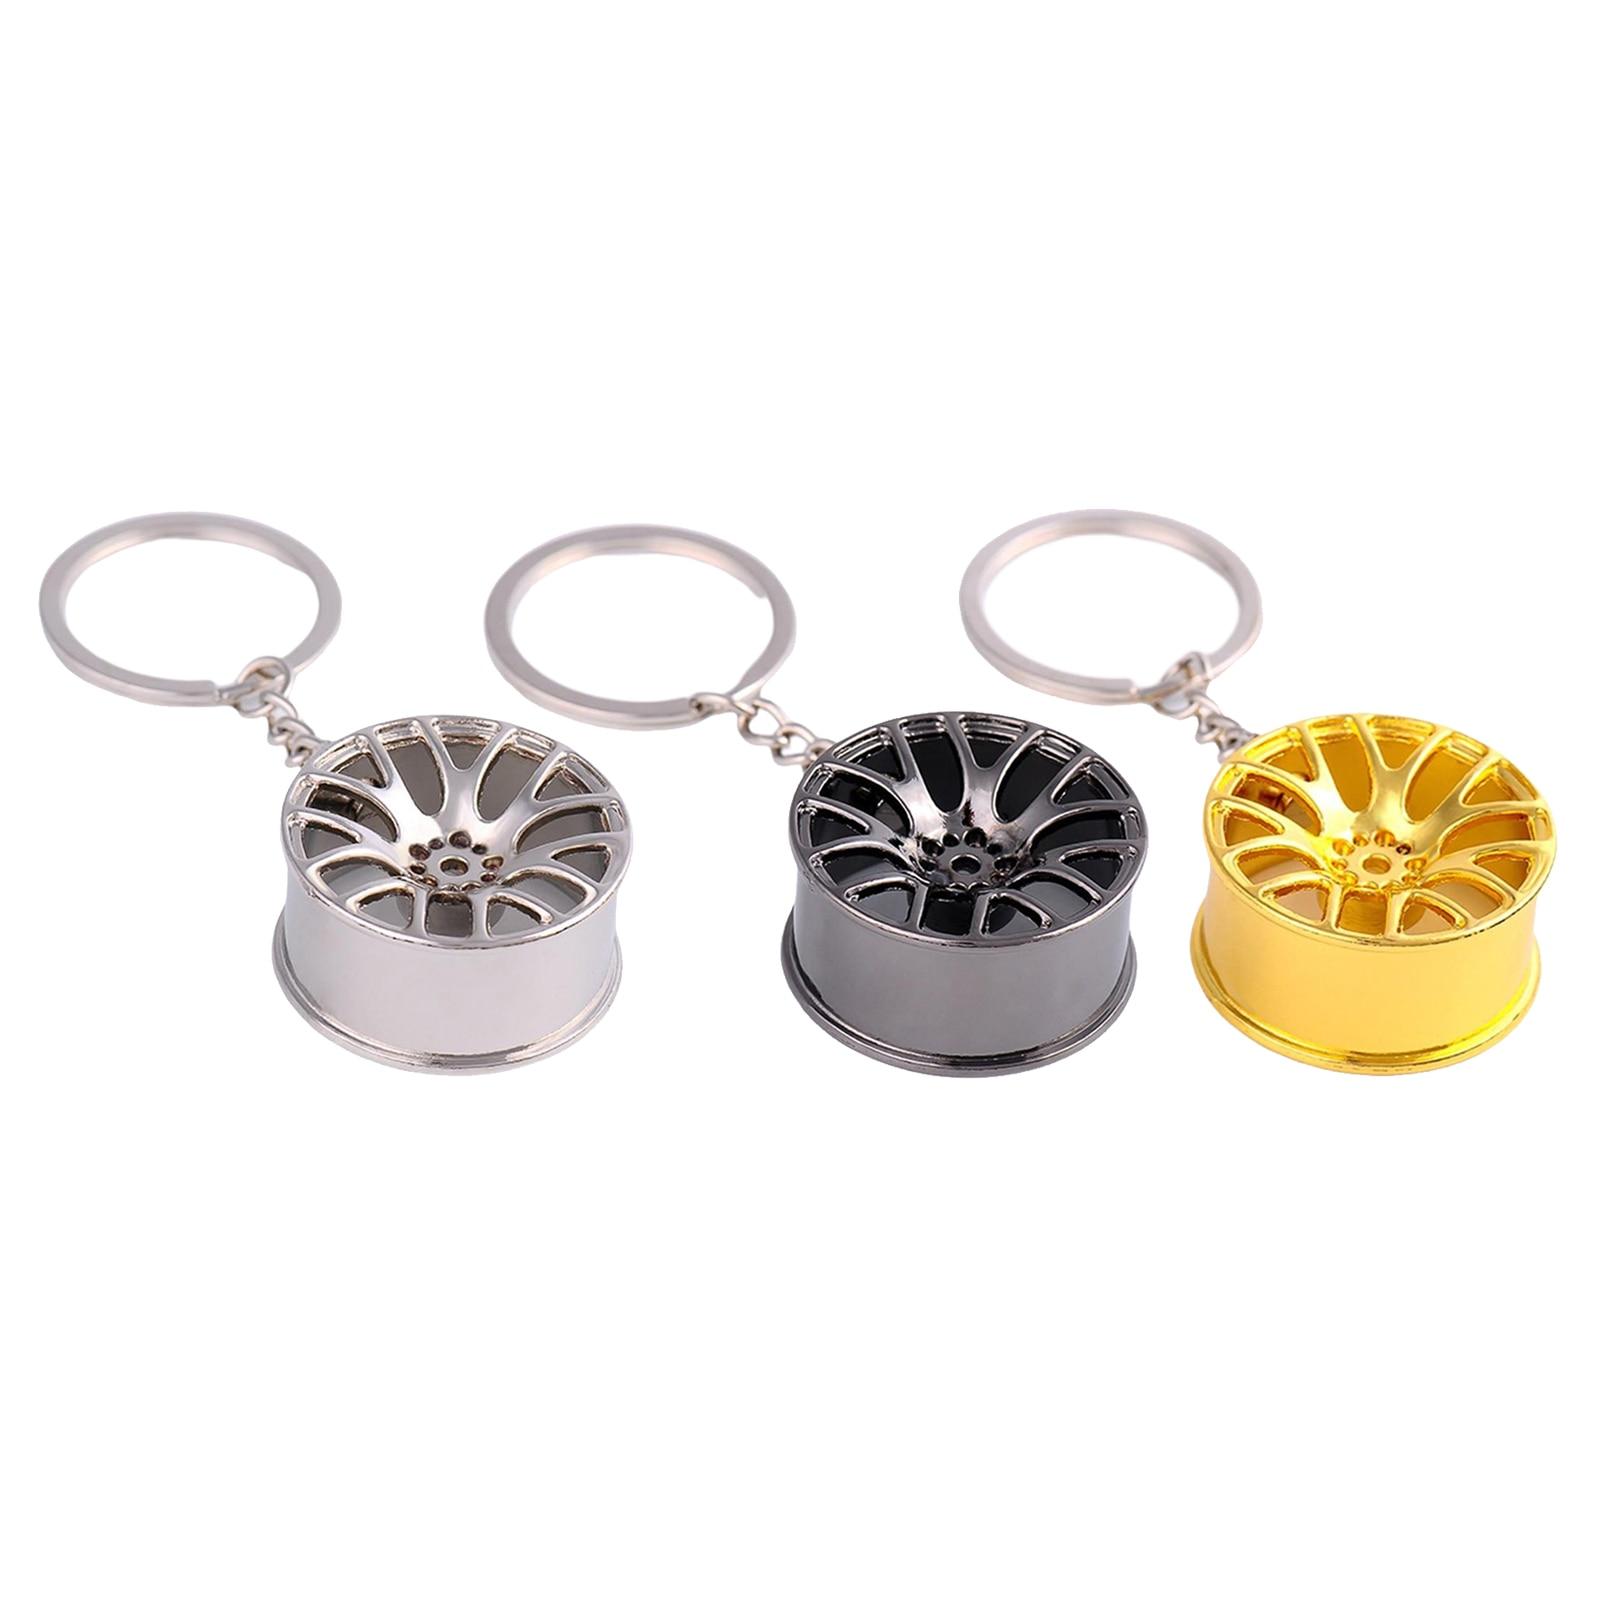 Metal Wheel Rim Keychain Auto Car Handbag Bag Wheel Hubs Key Chain Keyring Holder Hanging Pendant Charm Decor for Woman Man